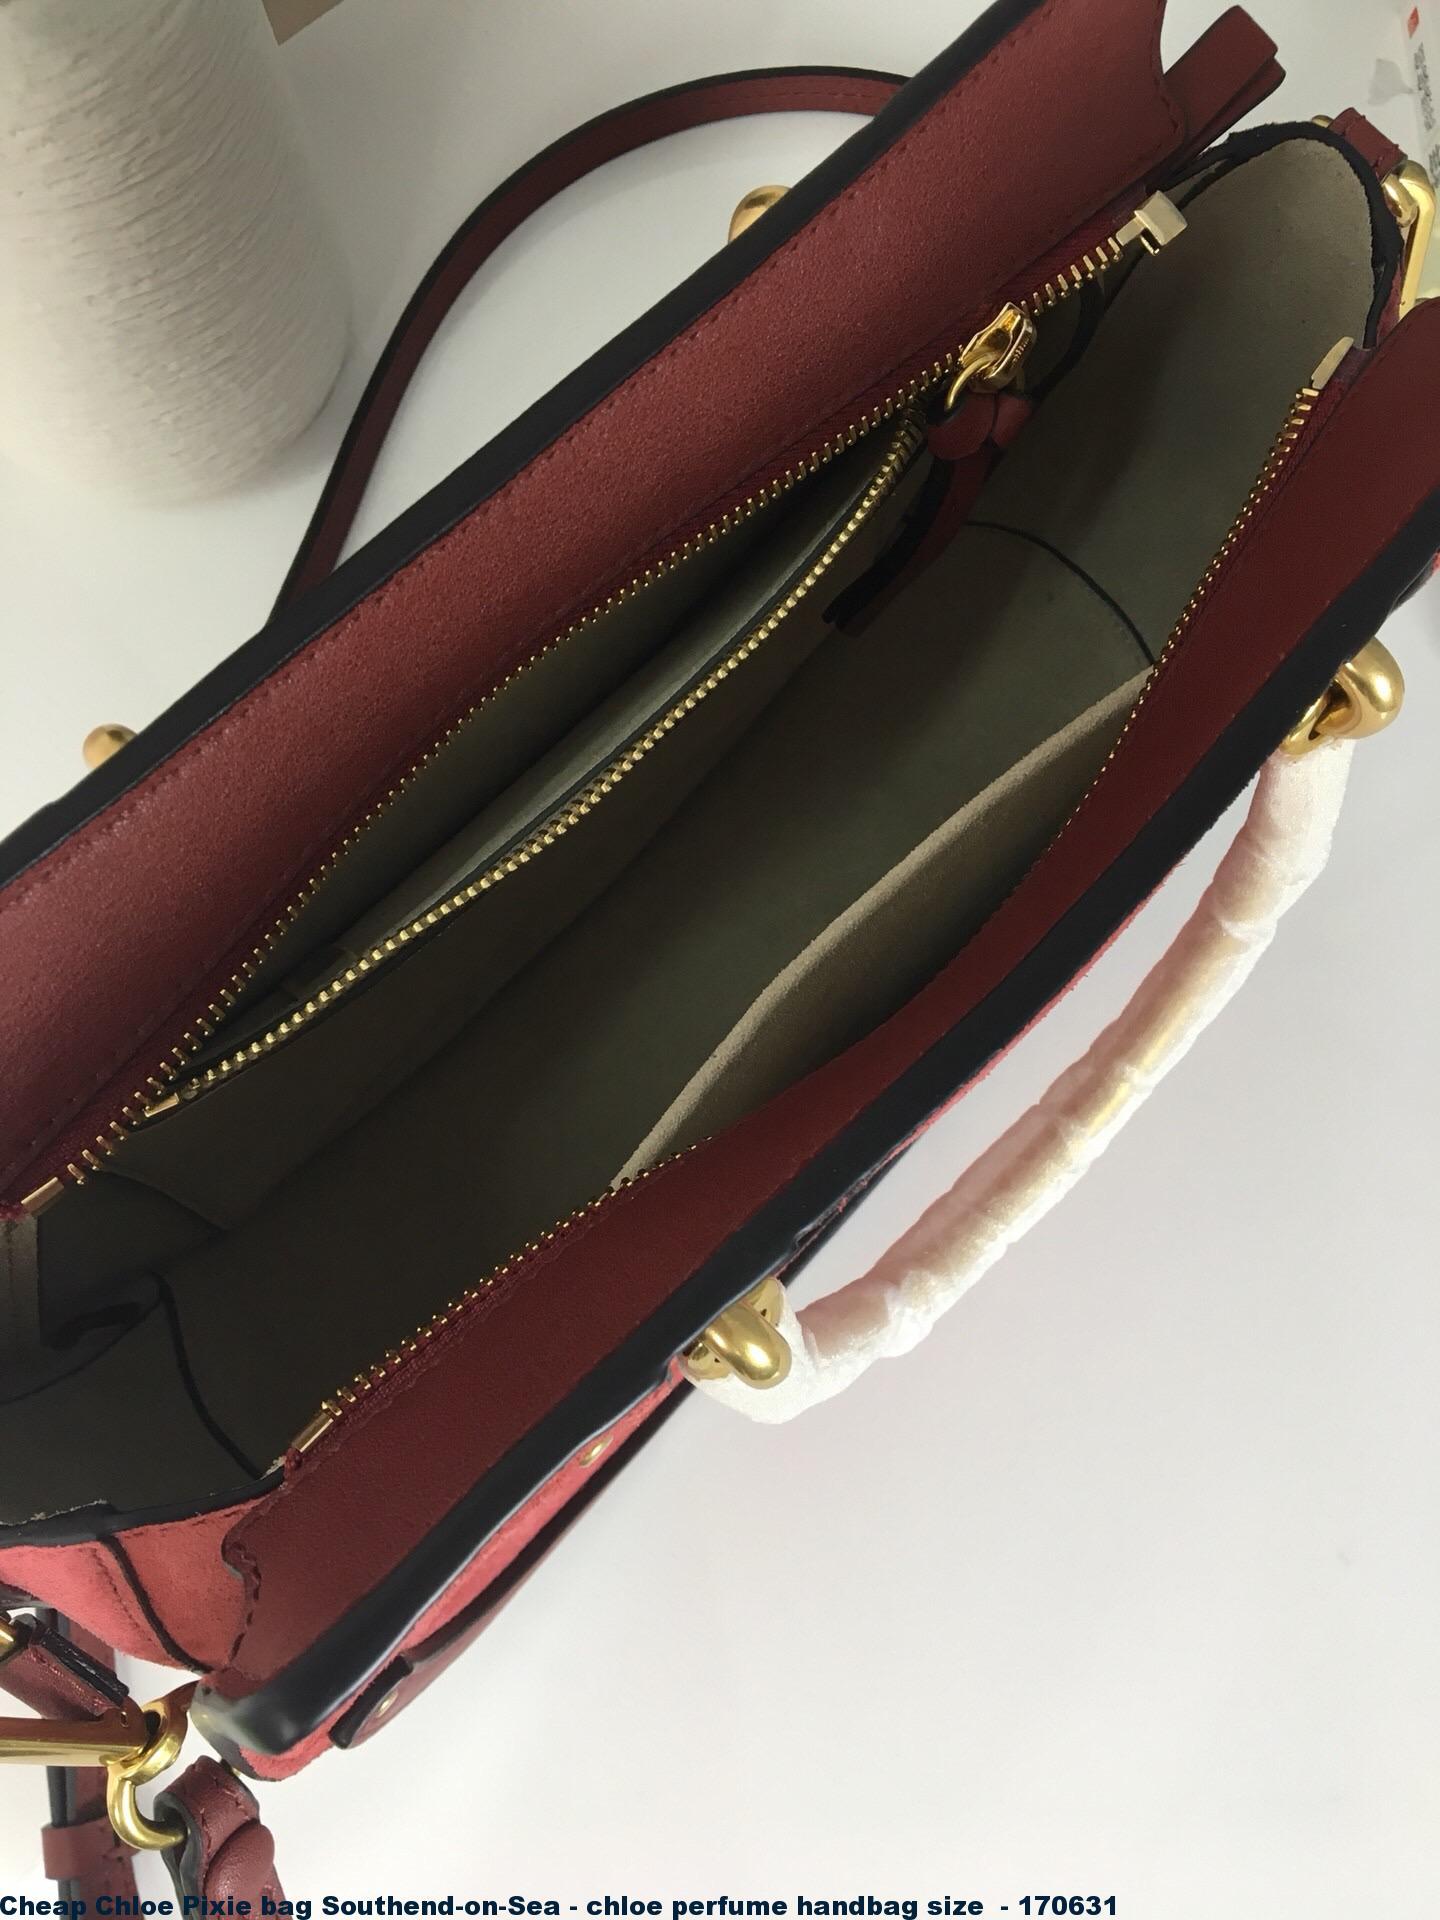 Southend Sea Handbag On 170631 Chloe Perfume Cheap Bag Pixie Size 4j5RAL